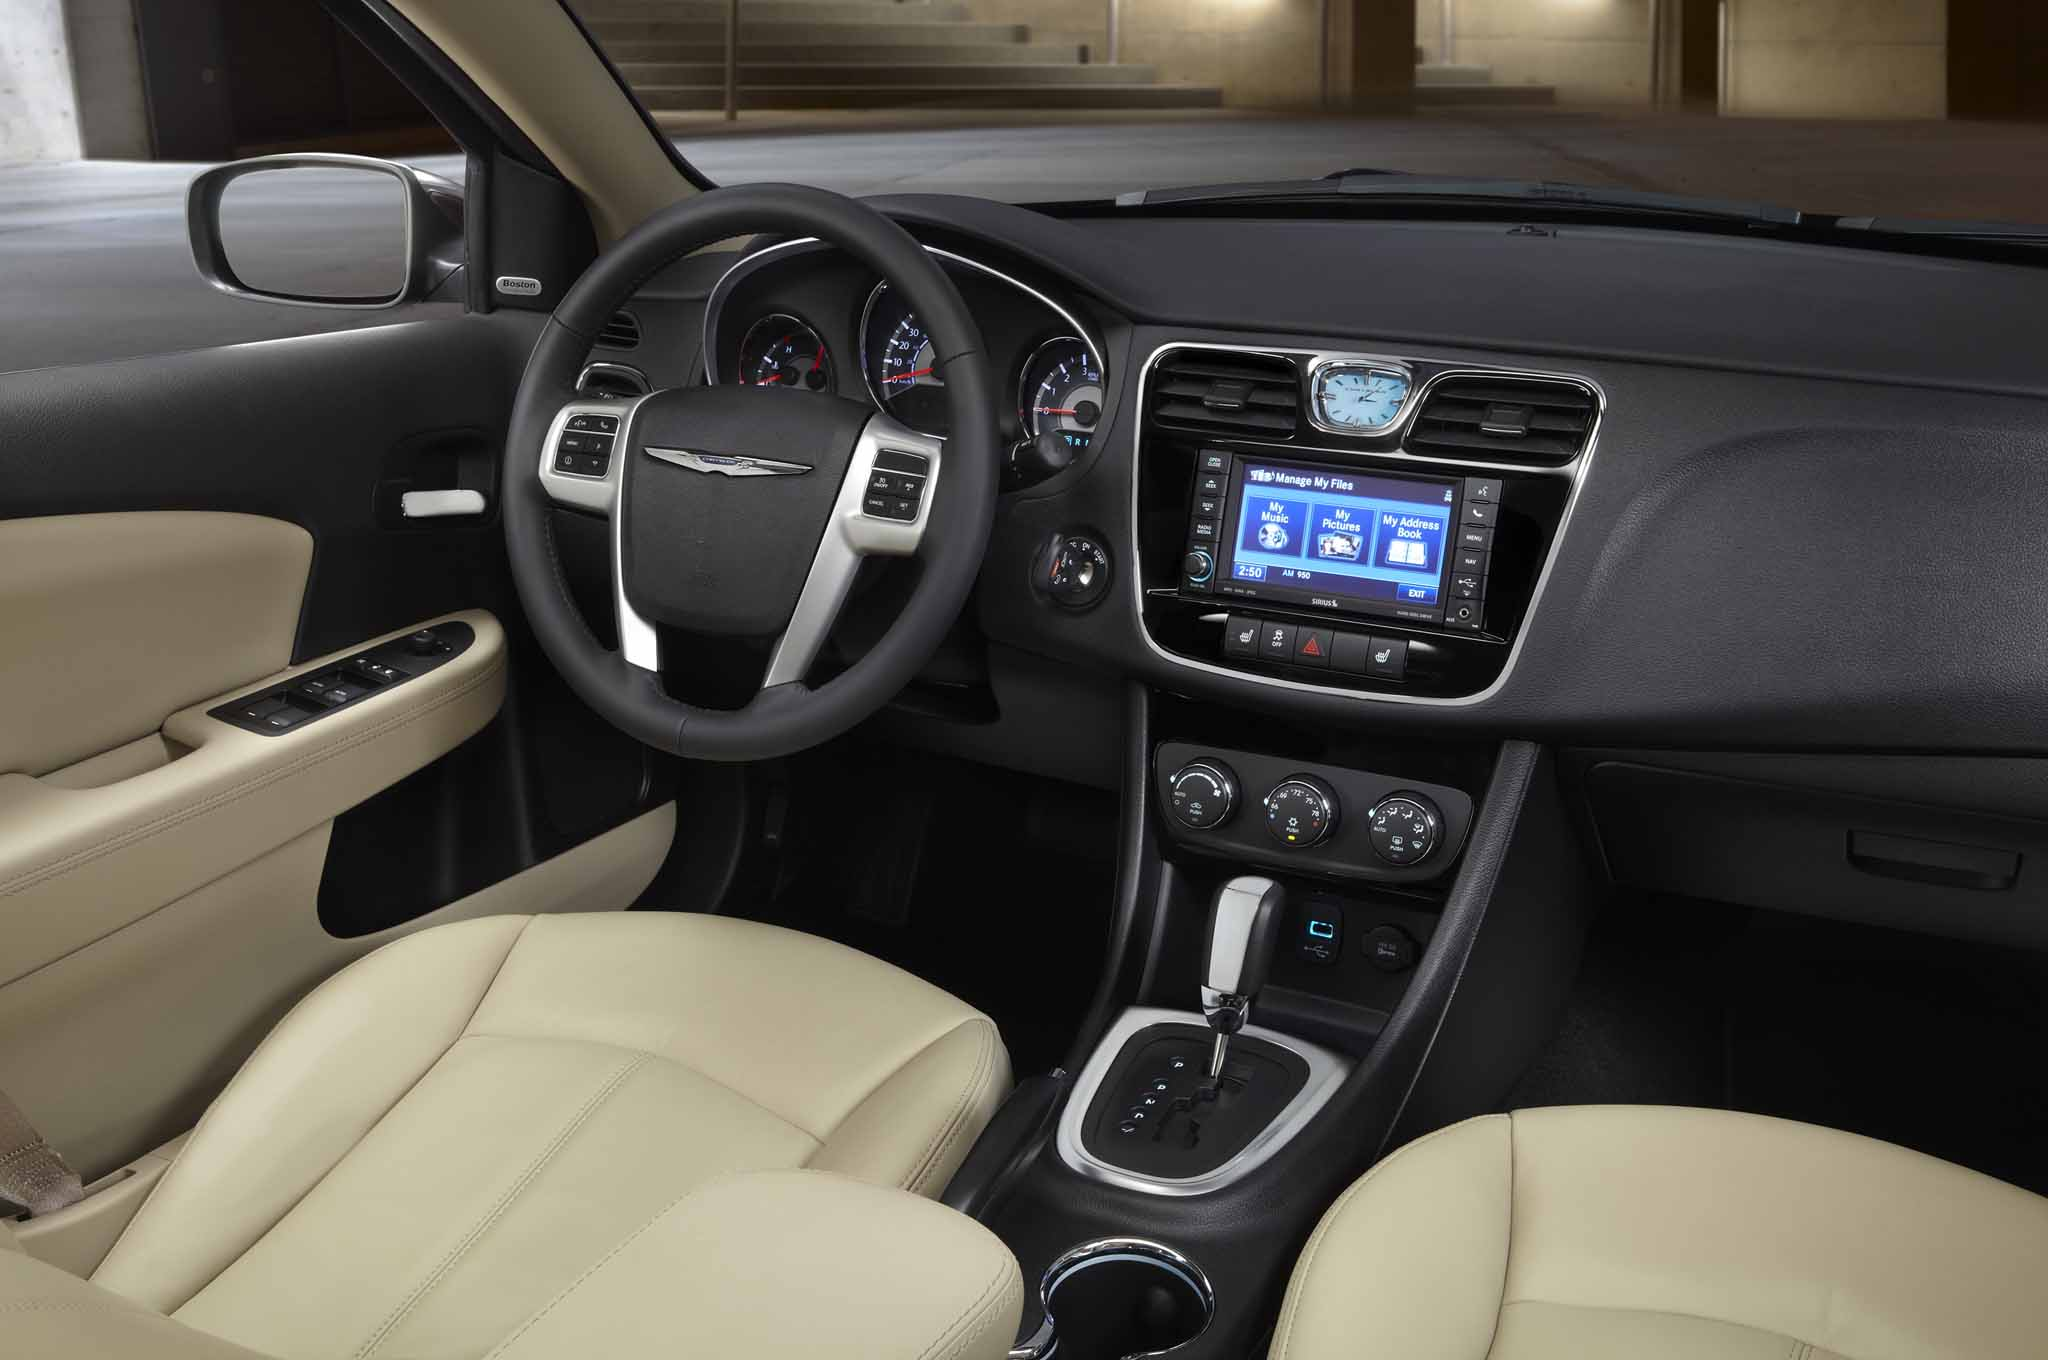 photo price reviews sedan chrysler wheel front photos features lx drive